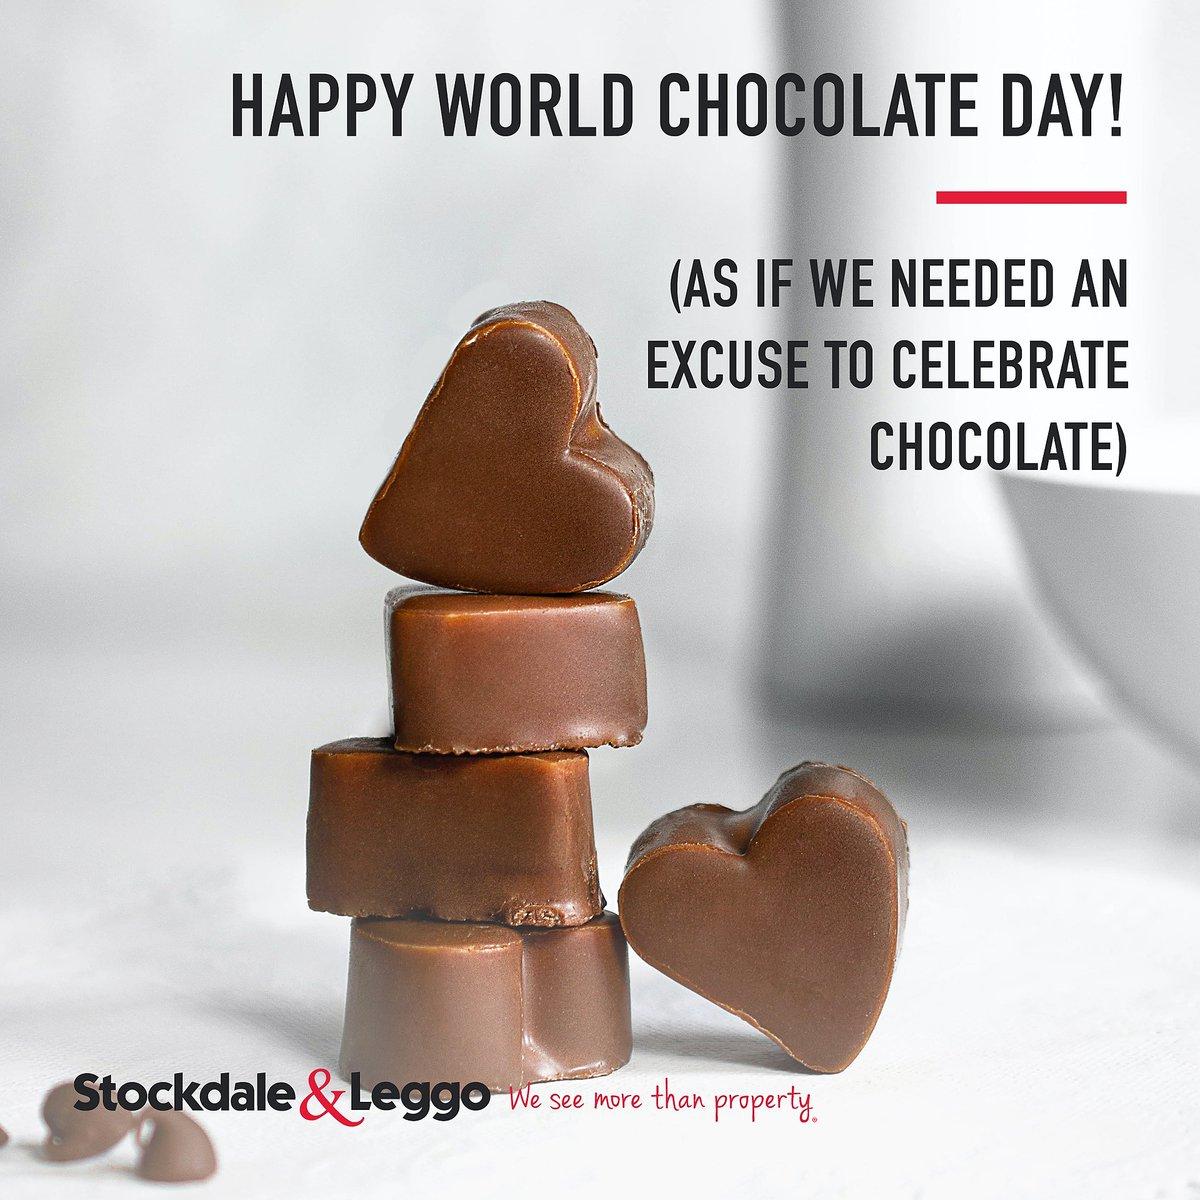 Happy #WorldChocolateDay - as if we needed an excuse to celebrate chocolate!  #StockdaleLeggo #ChocolateDay https://t.co/v2zdrt1uv5